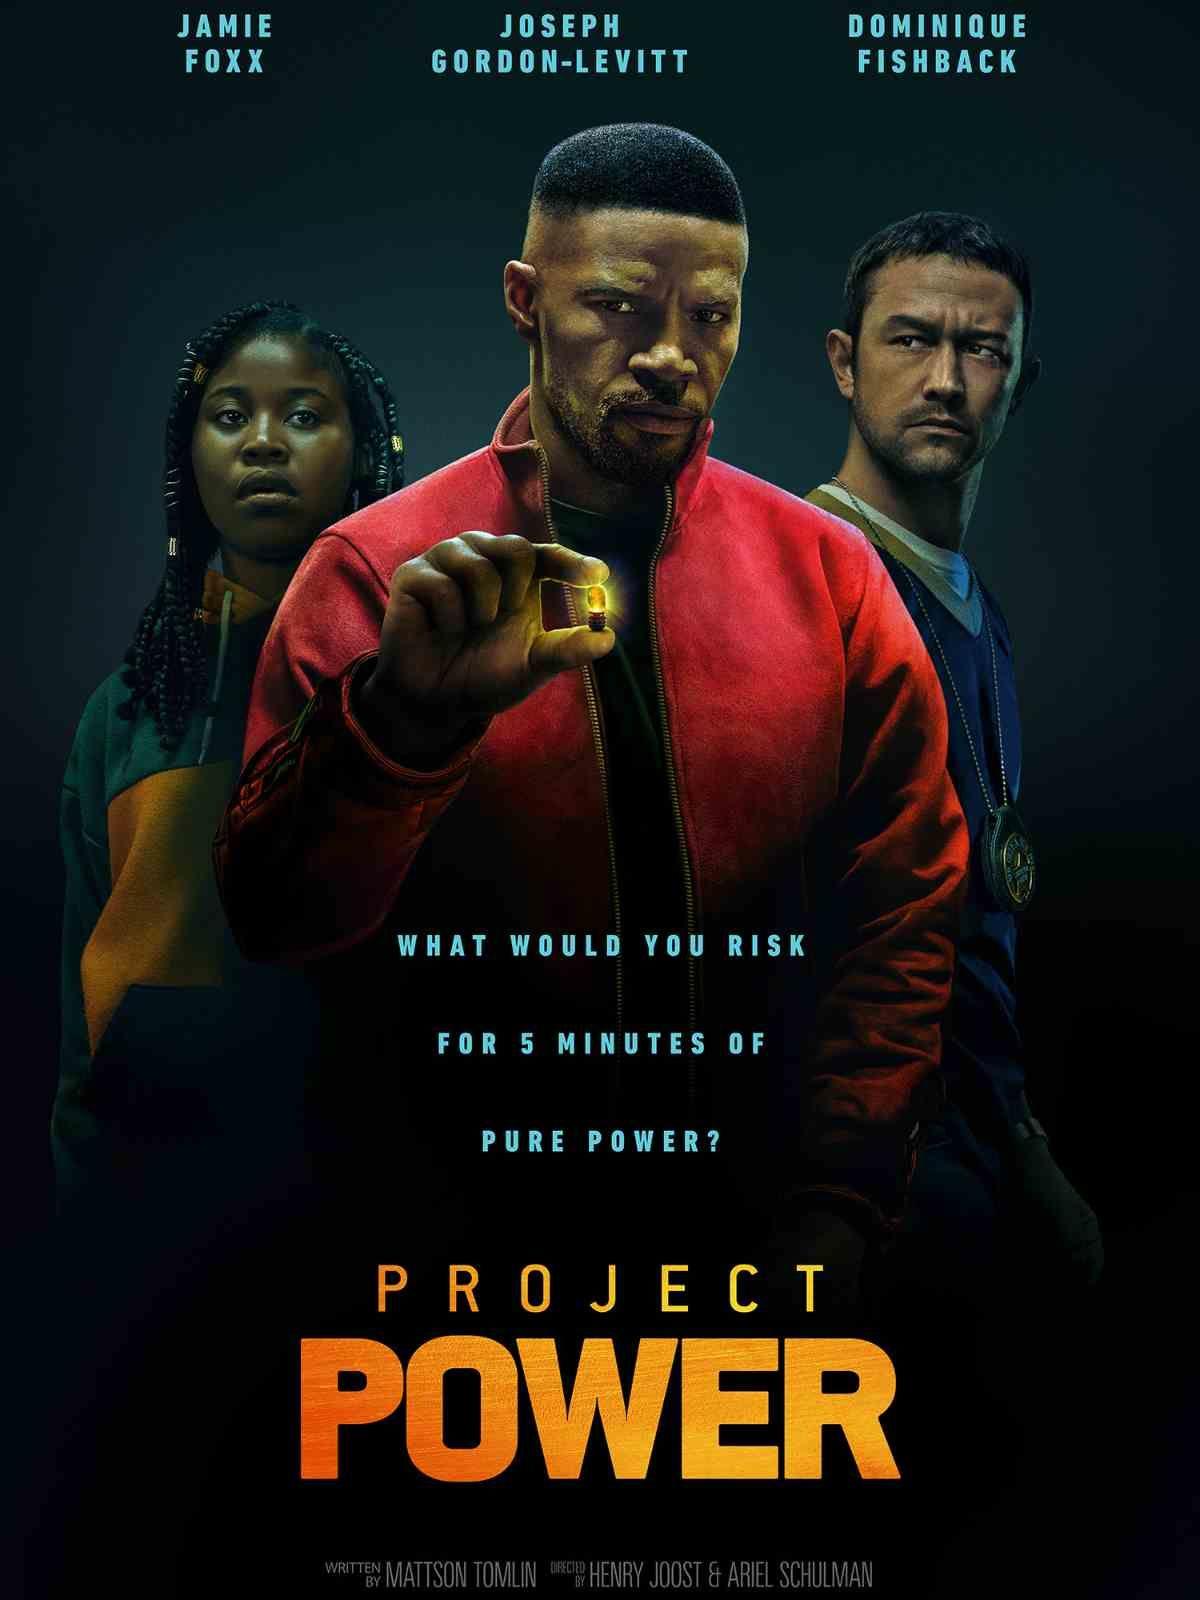 Proyecto Power Netflix Assistir Filmes Gratis Filmes Online Gratis Legendados Filmes Online Gratis